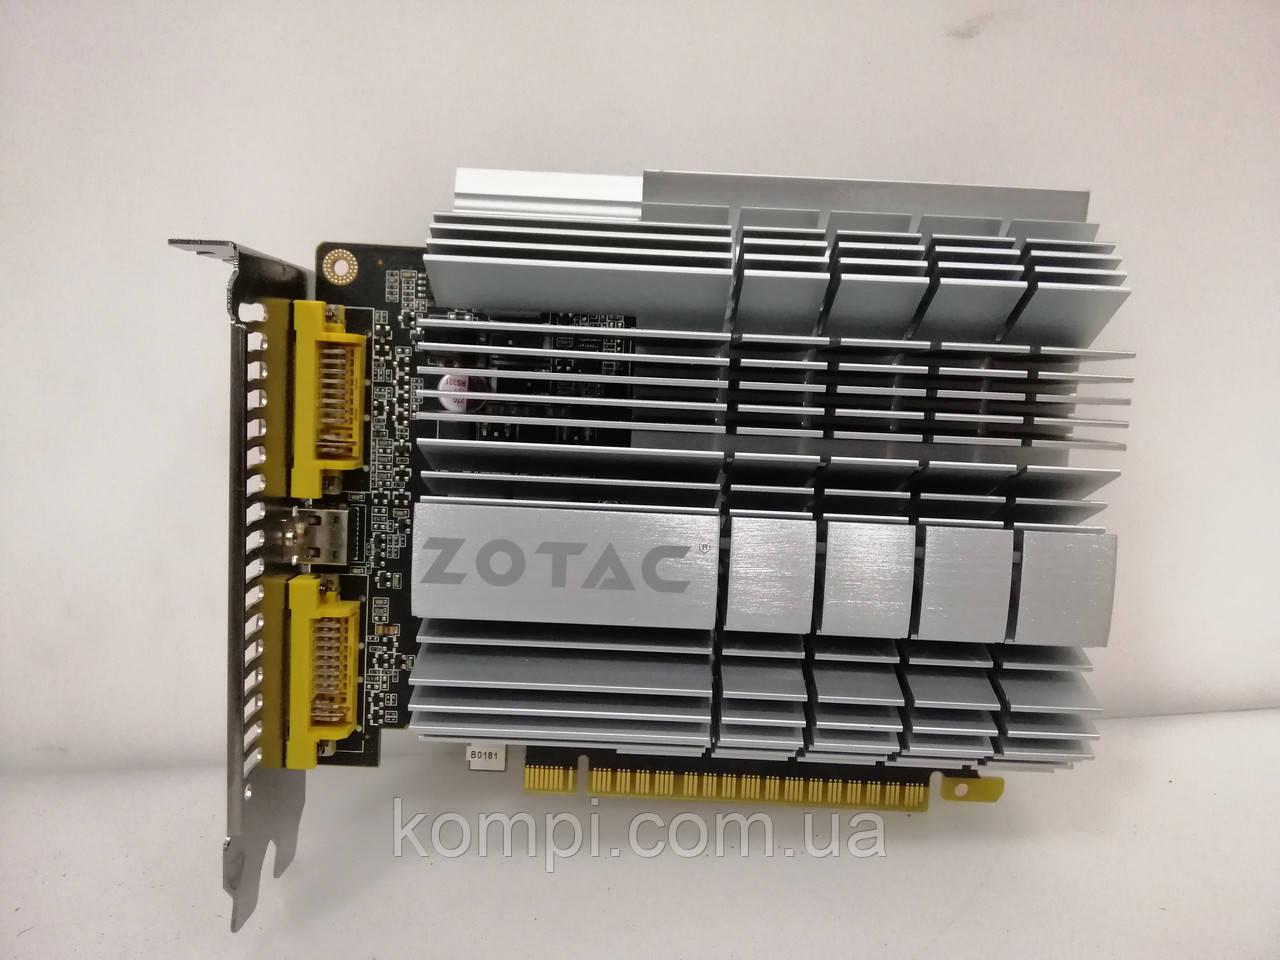 Відеокарта NVIDIA GT 630 1GB PCI-E HDMI